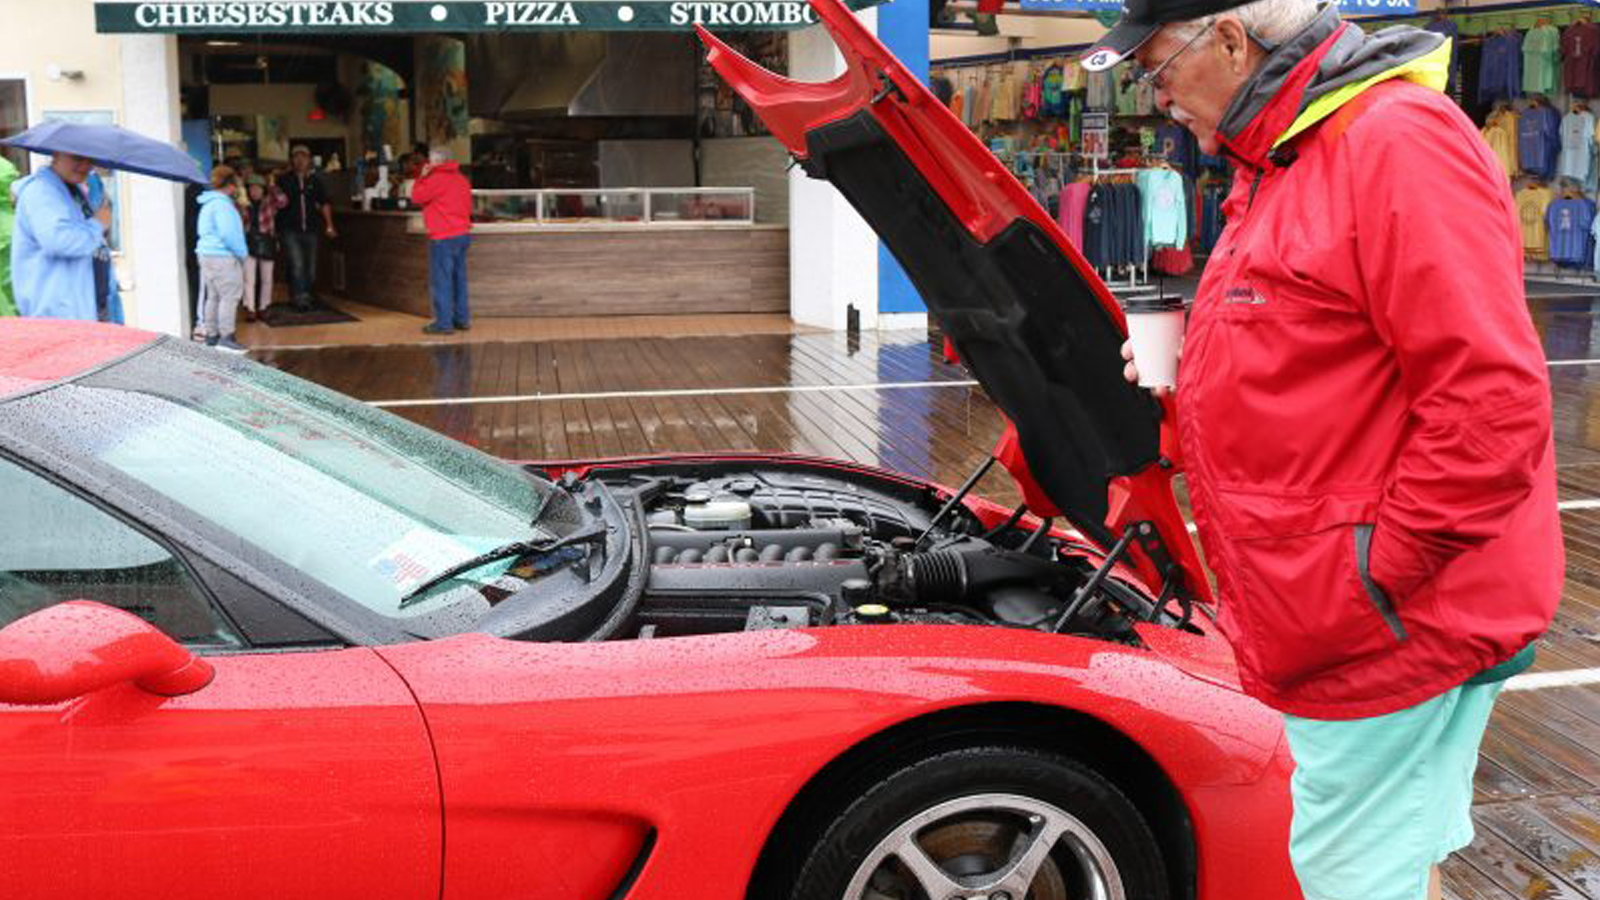 Ocean City Corvette Show On A Rainy Day Corvetteforum - Ocean city car show 2018